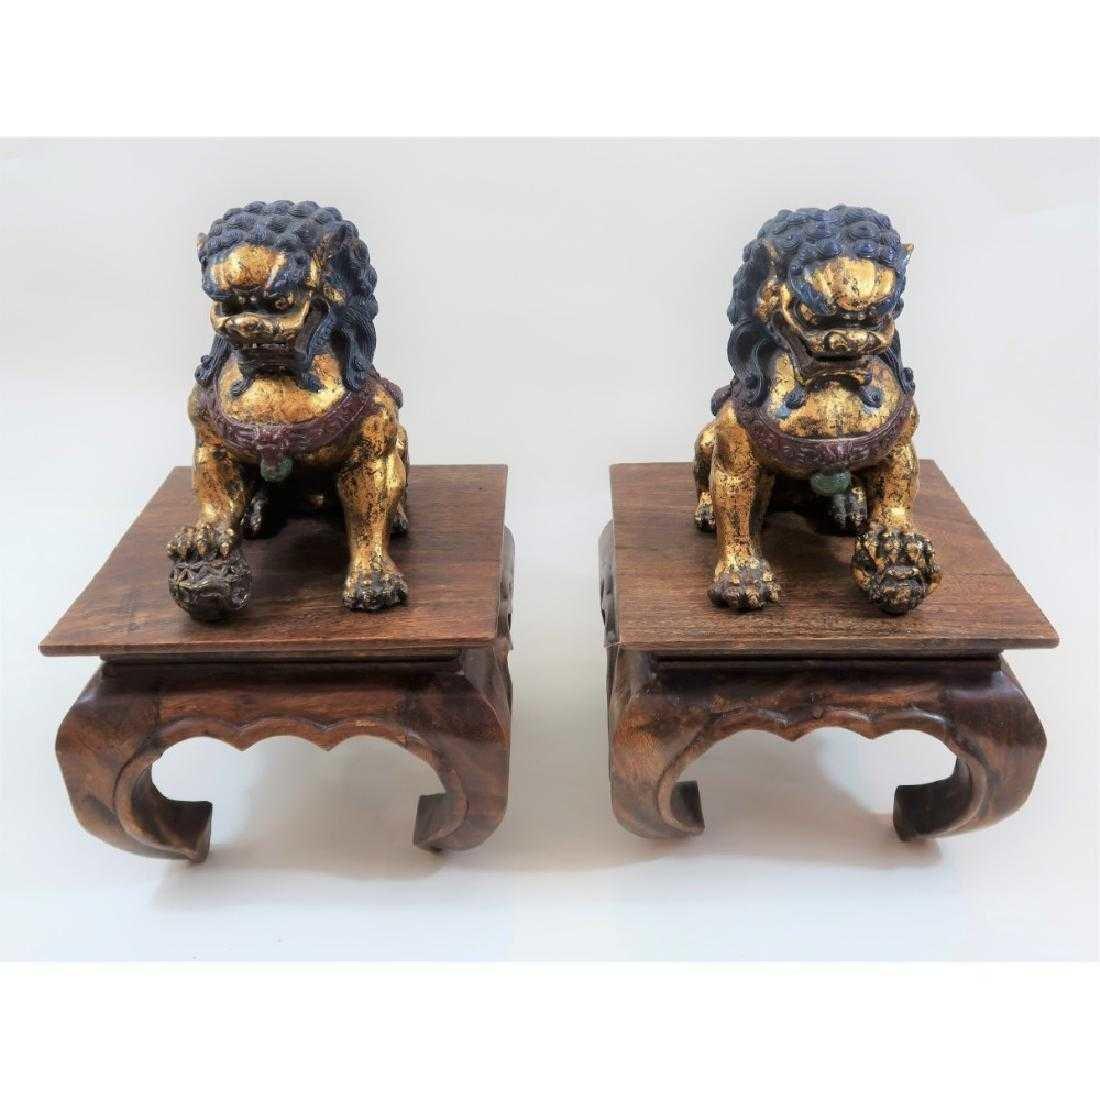 Pair of iron foo dogs 1800s